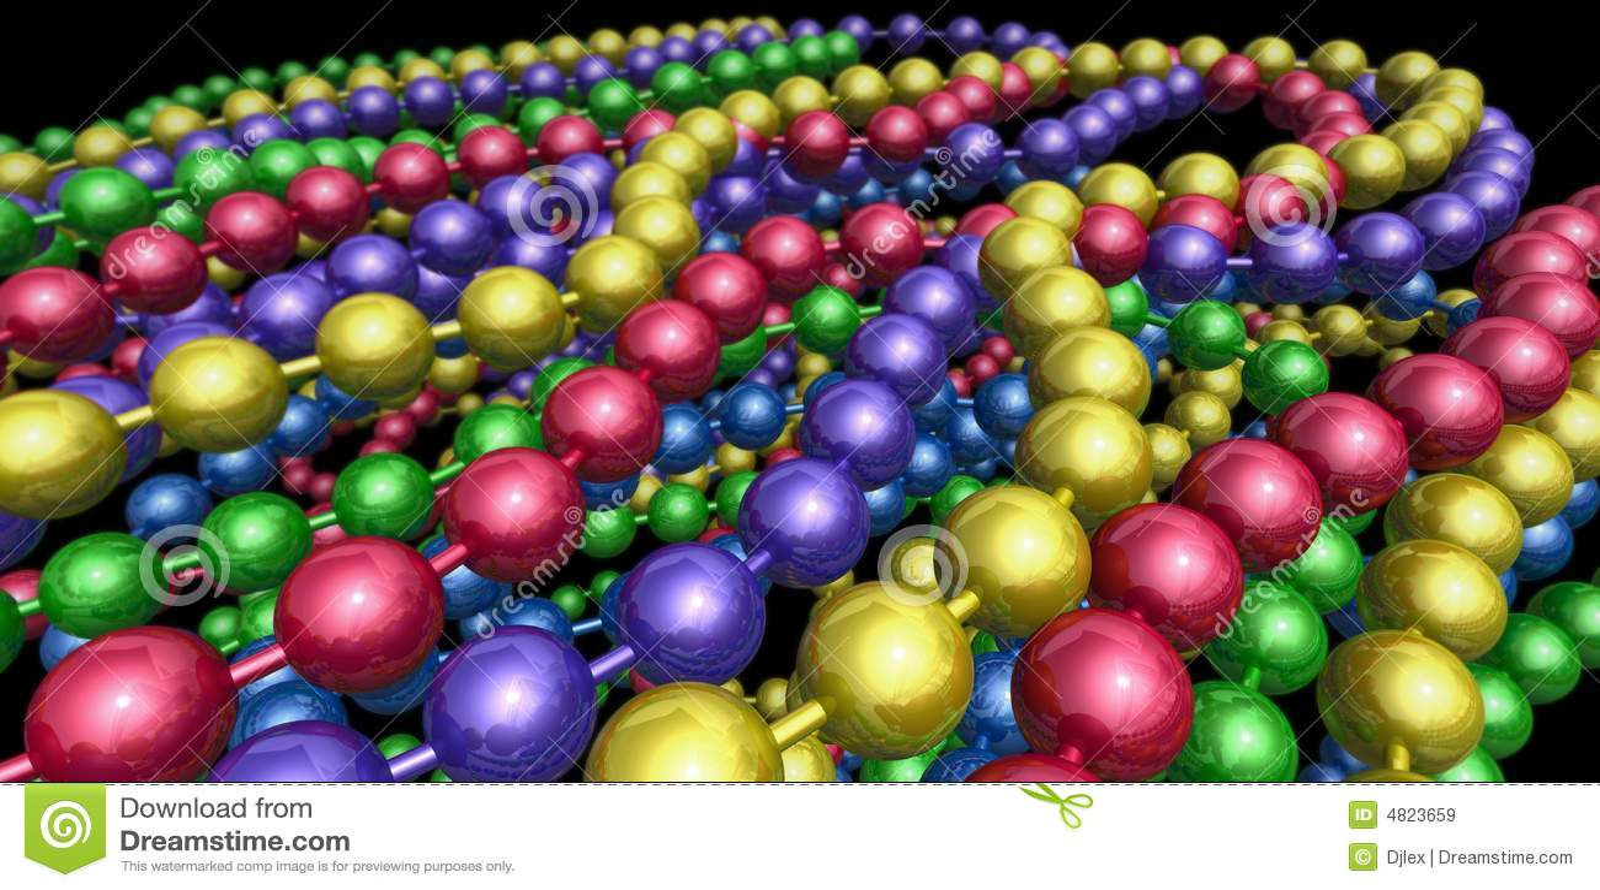 Mardi Gras Beads Border 3d mardi gras beads royalty